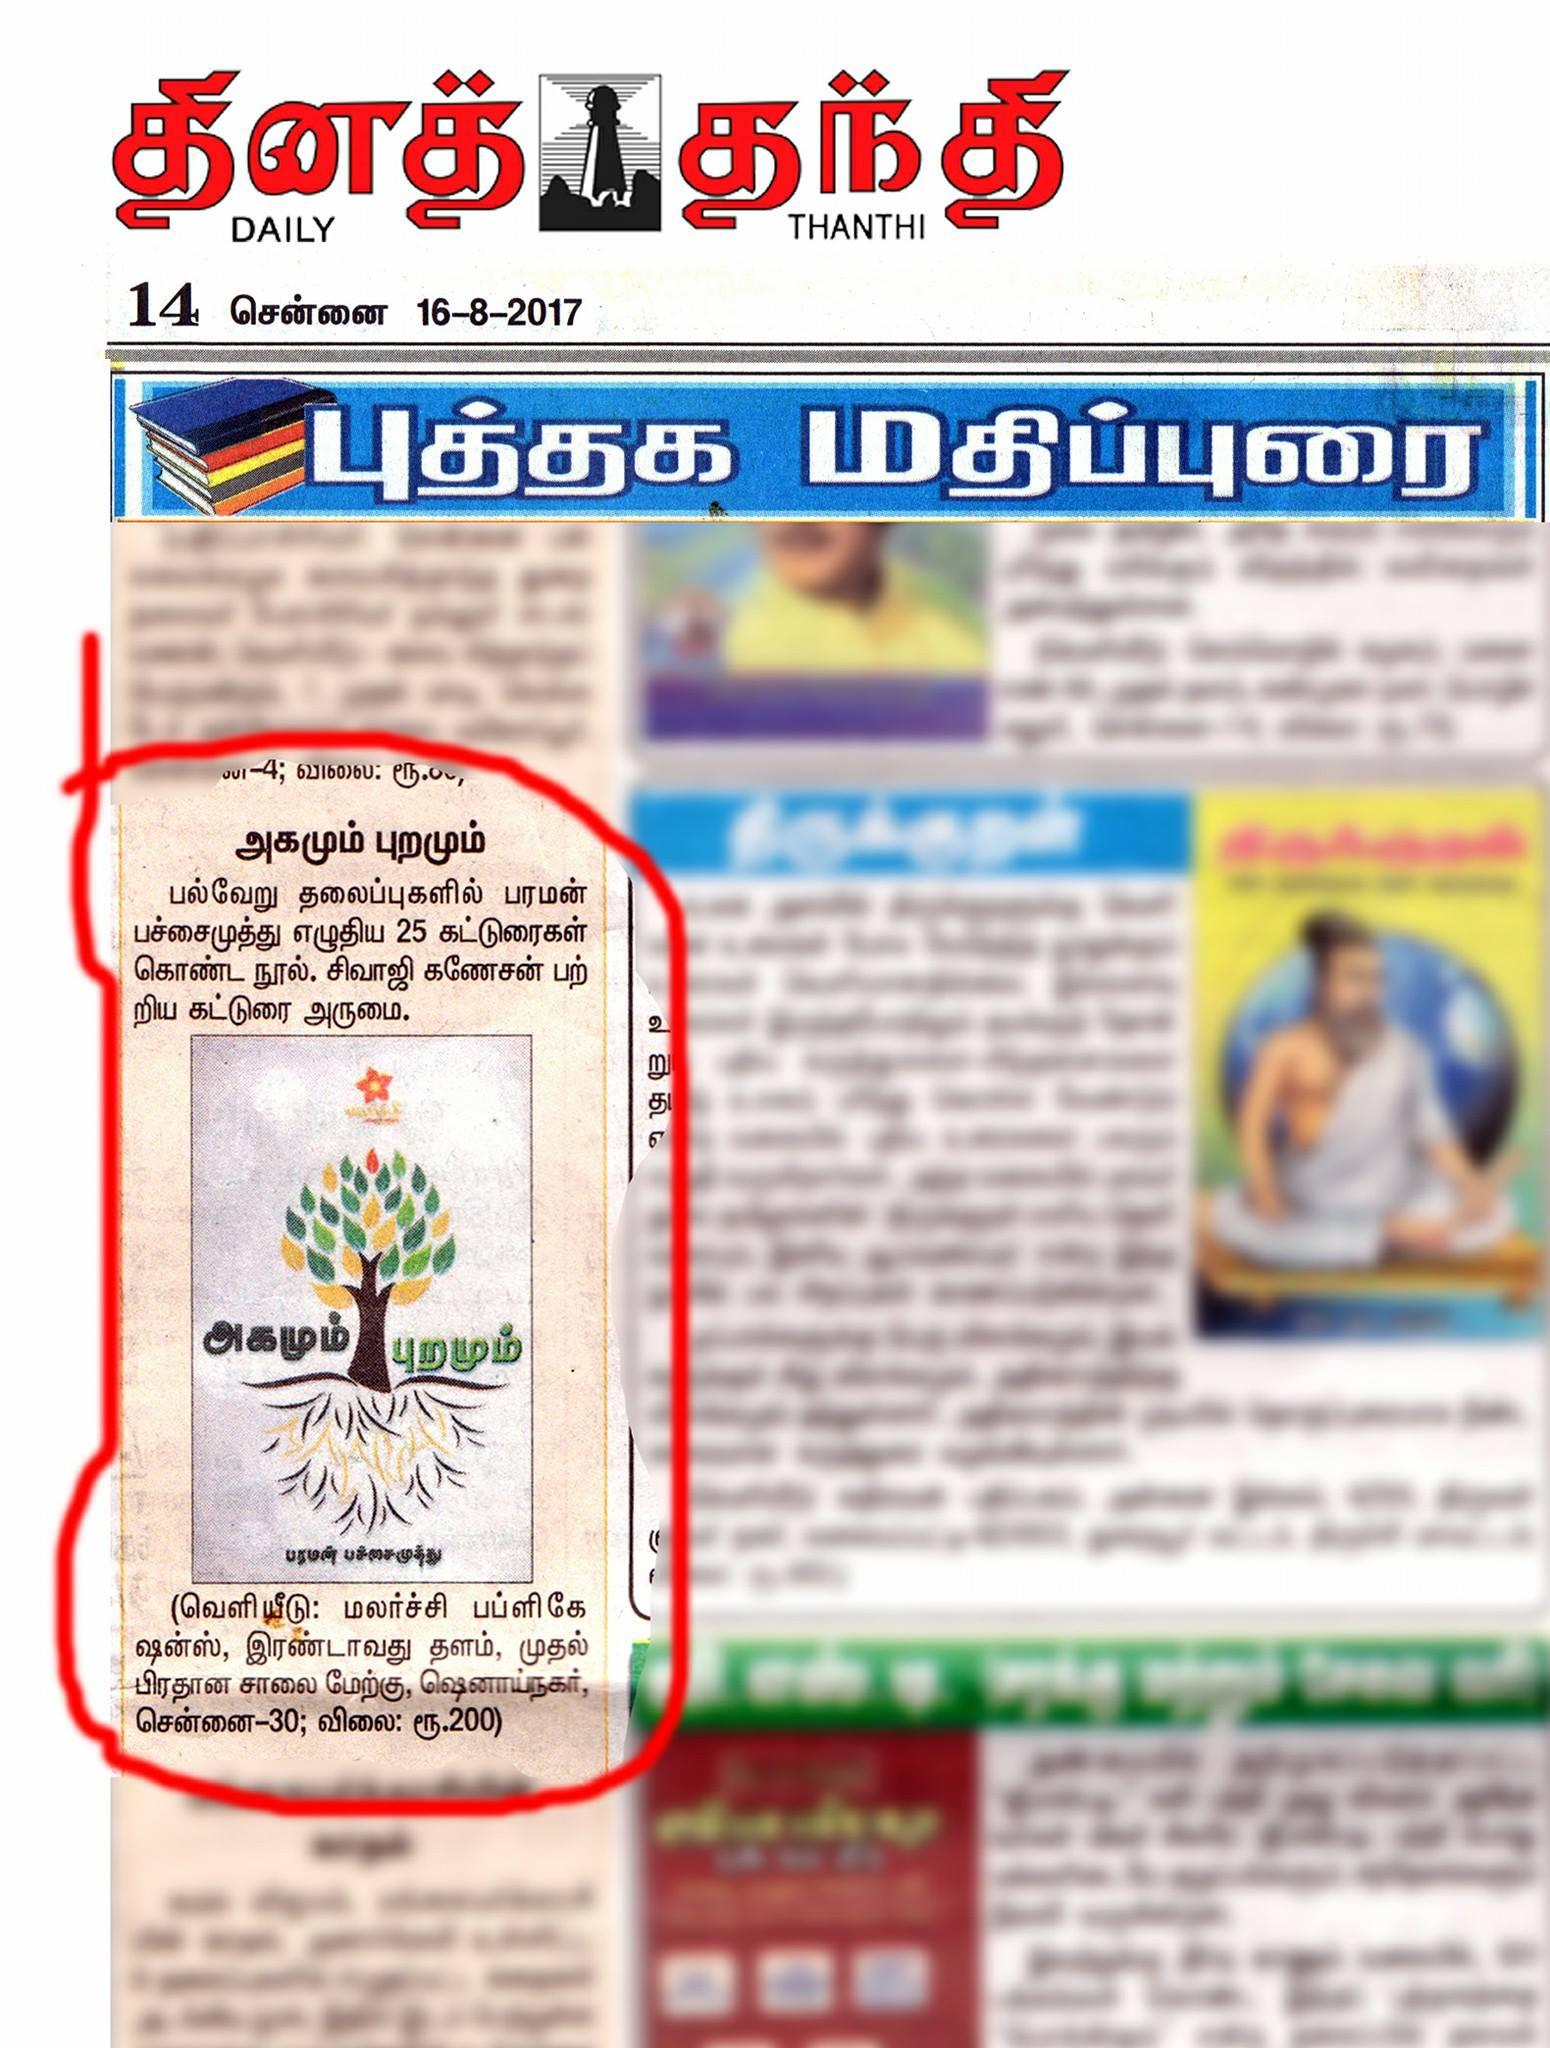 Daily Thanthi Agamum Puramum Review